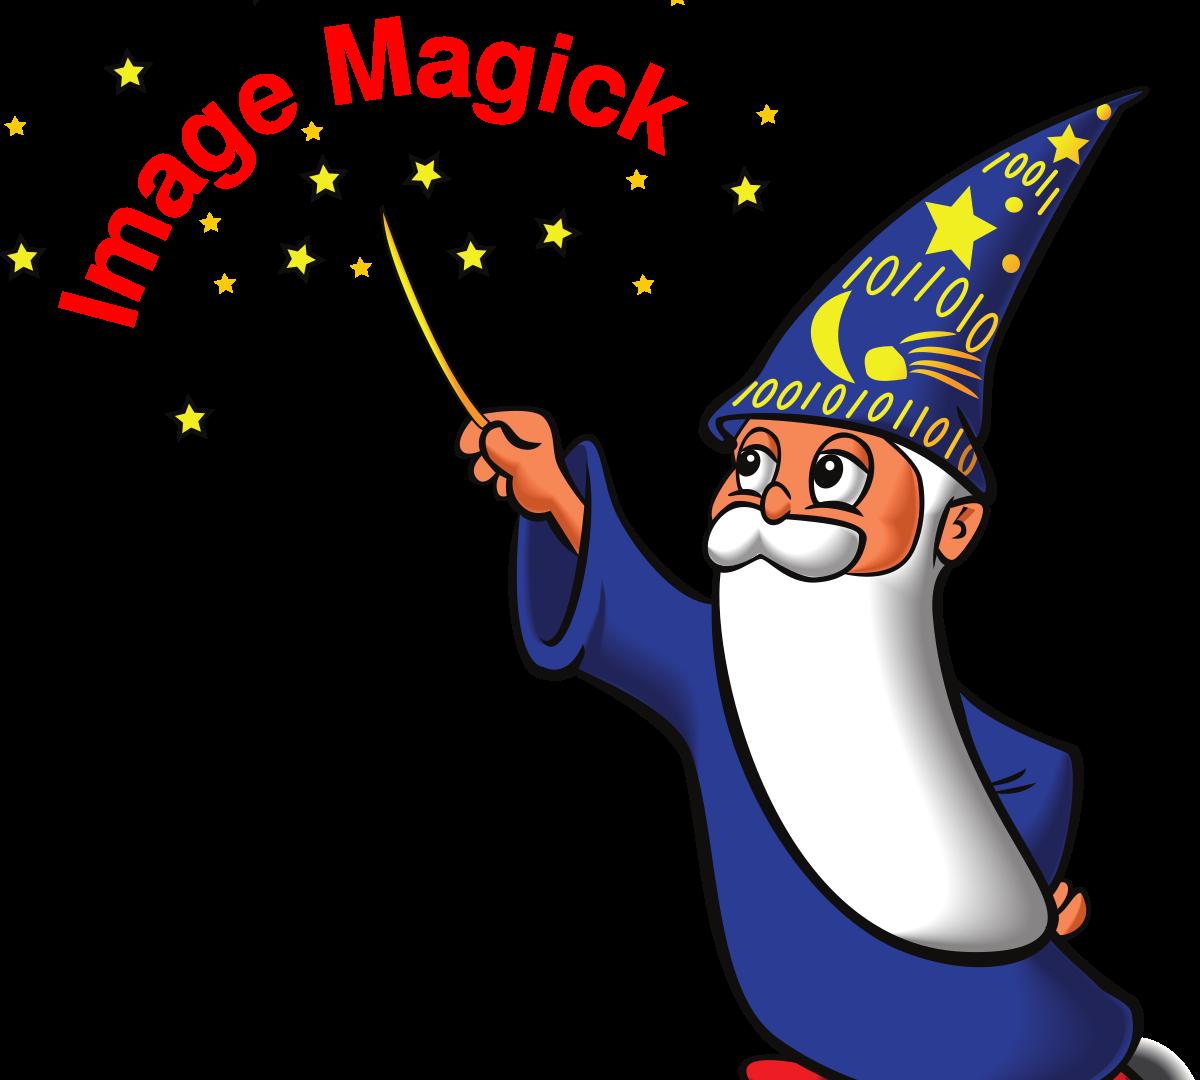 ImageMagick ロゴ